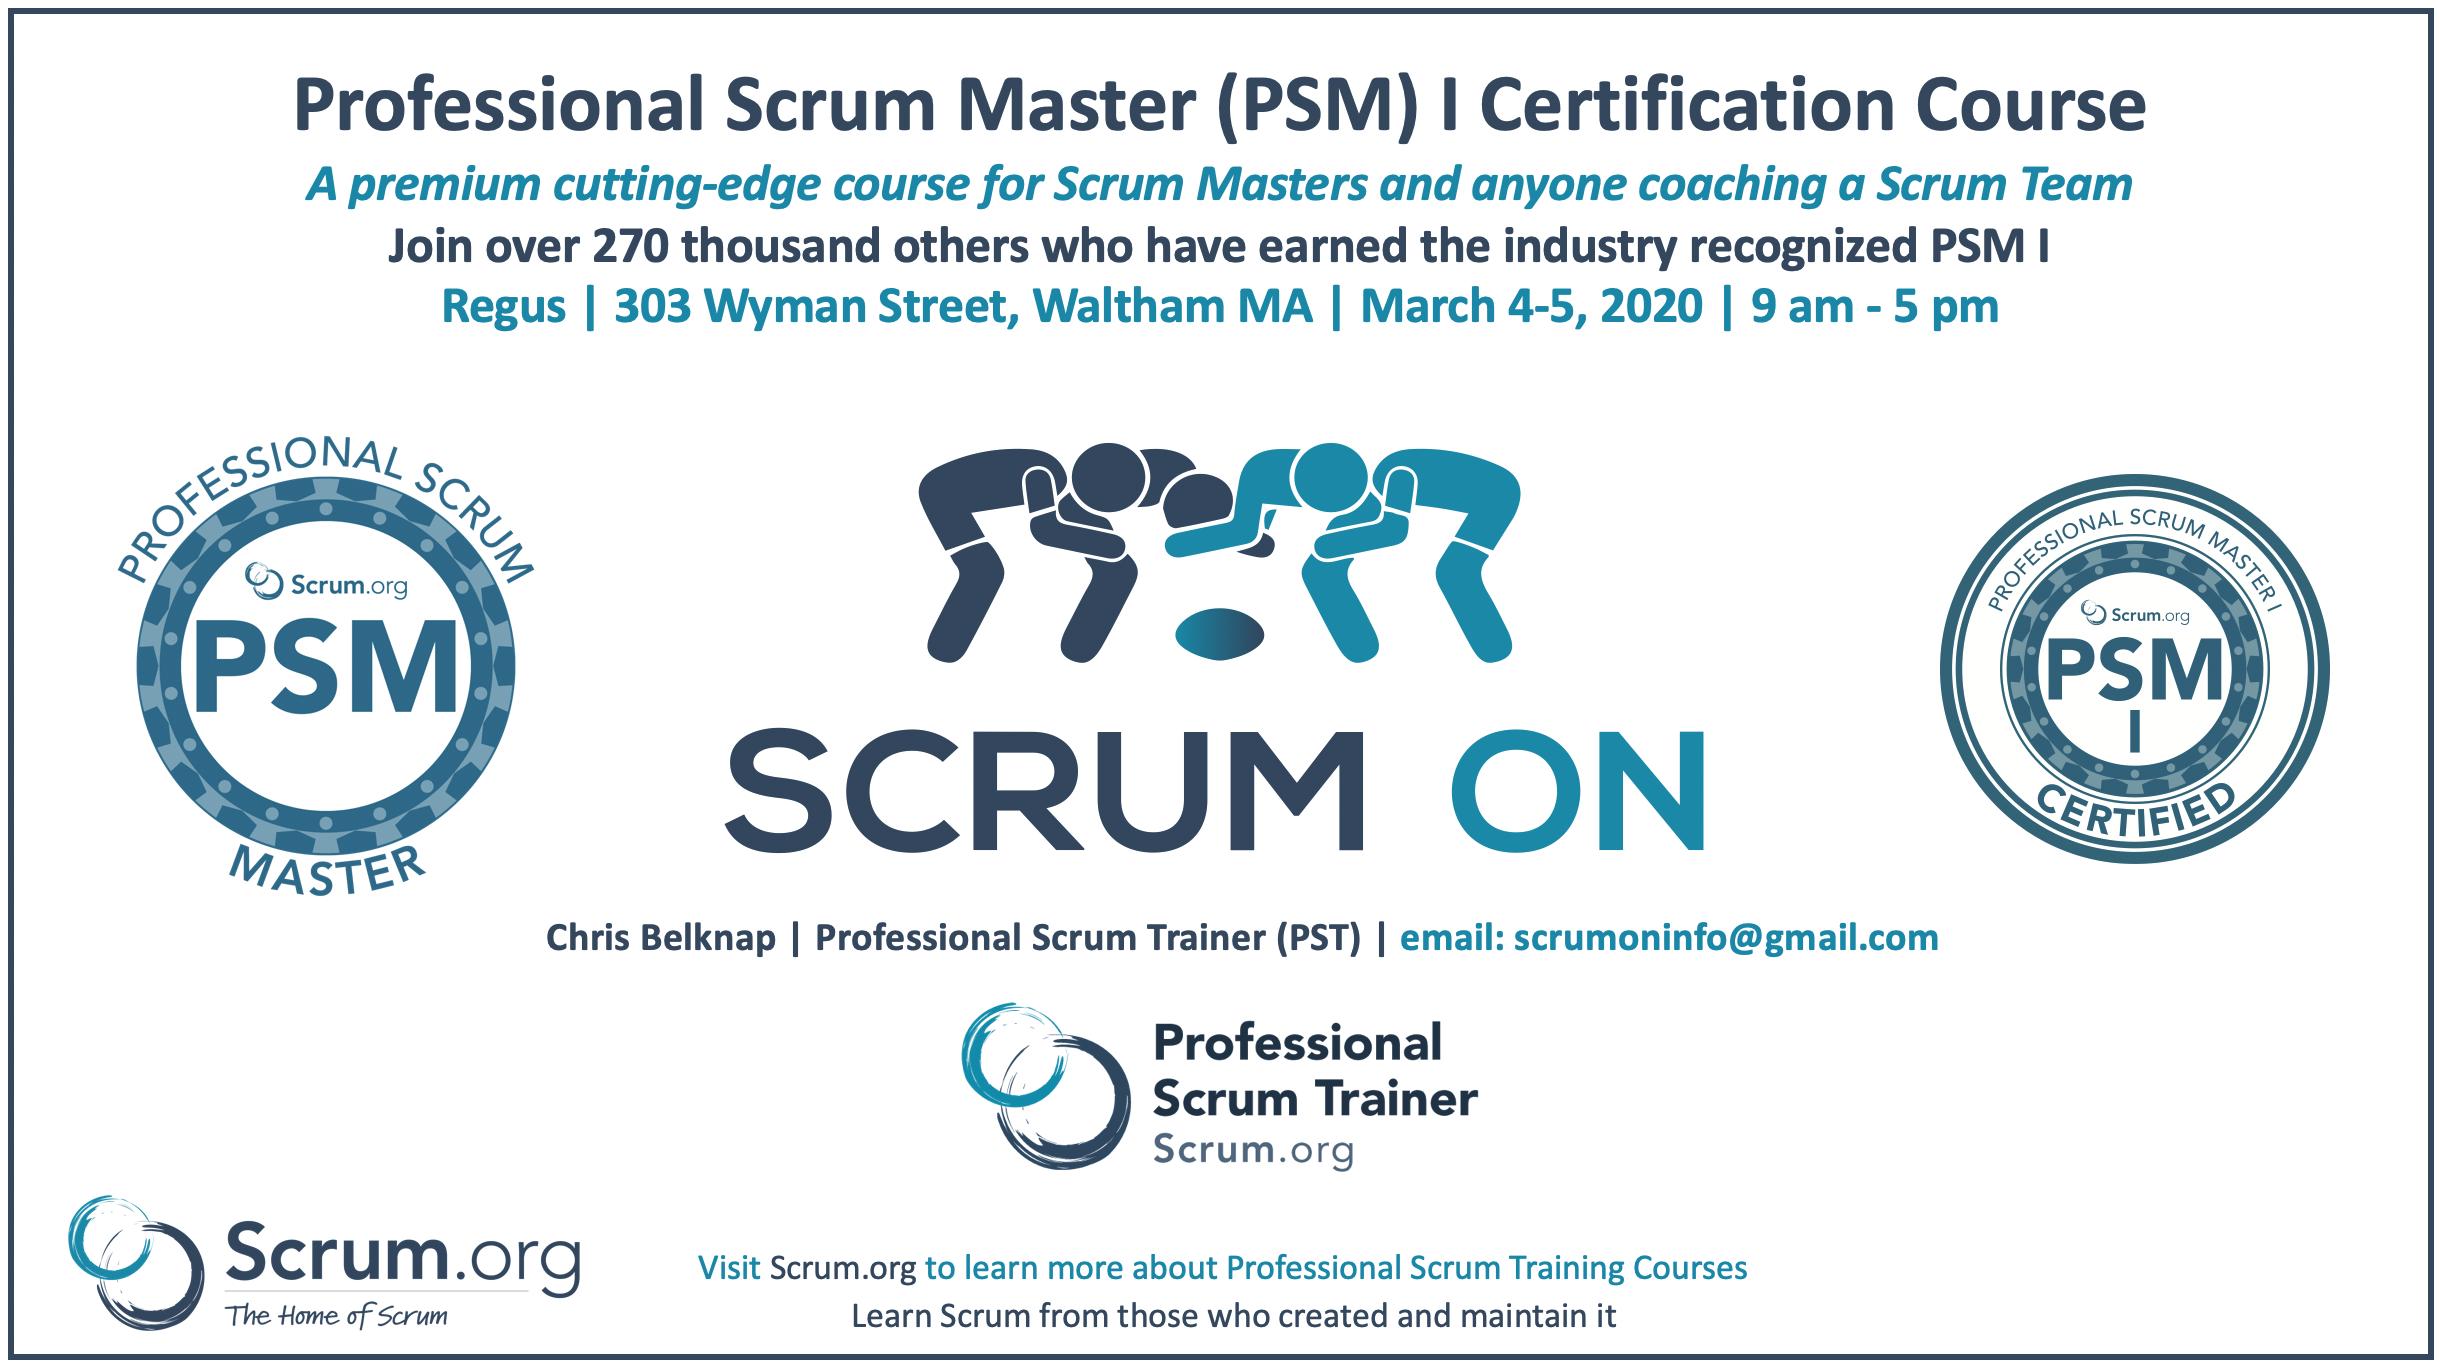 Professional Scrum Master PSM Waltham MA